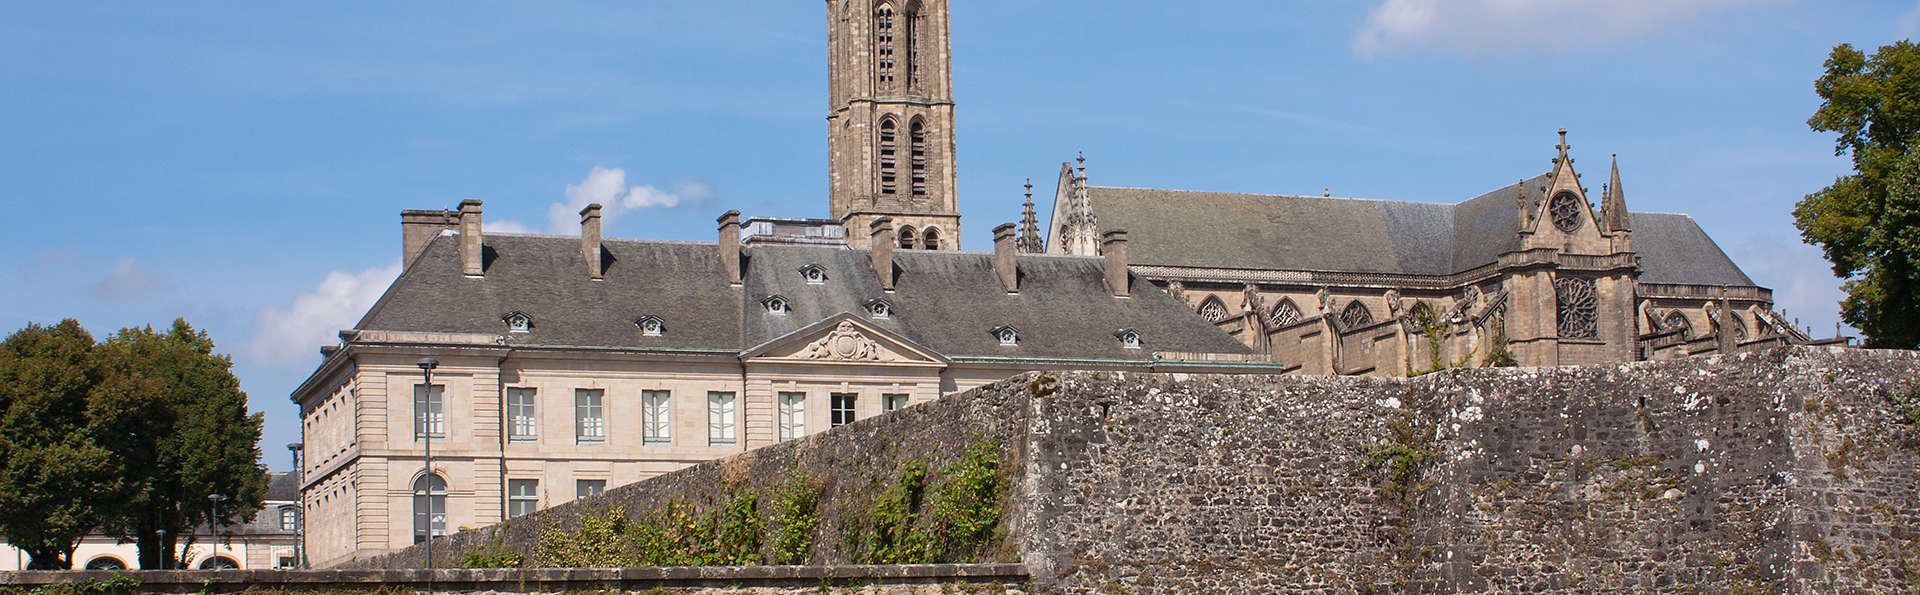 Hotel Ibis Limoges Nord